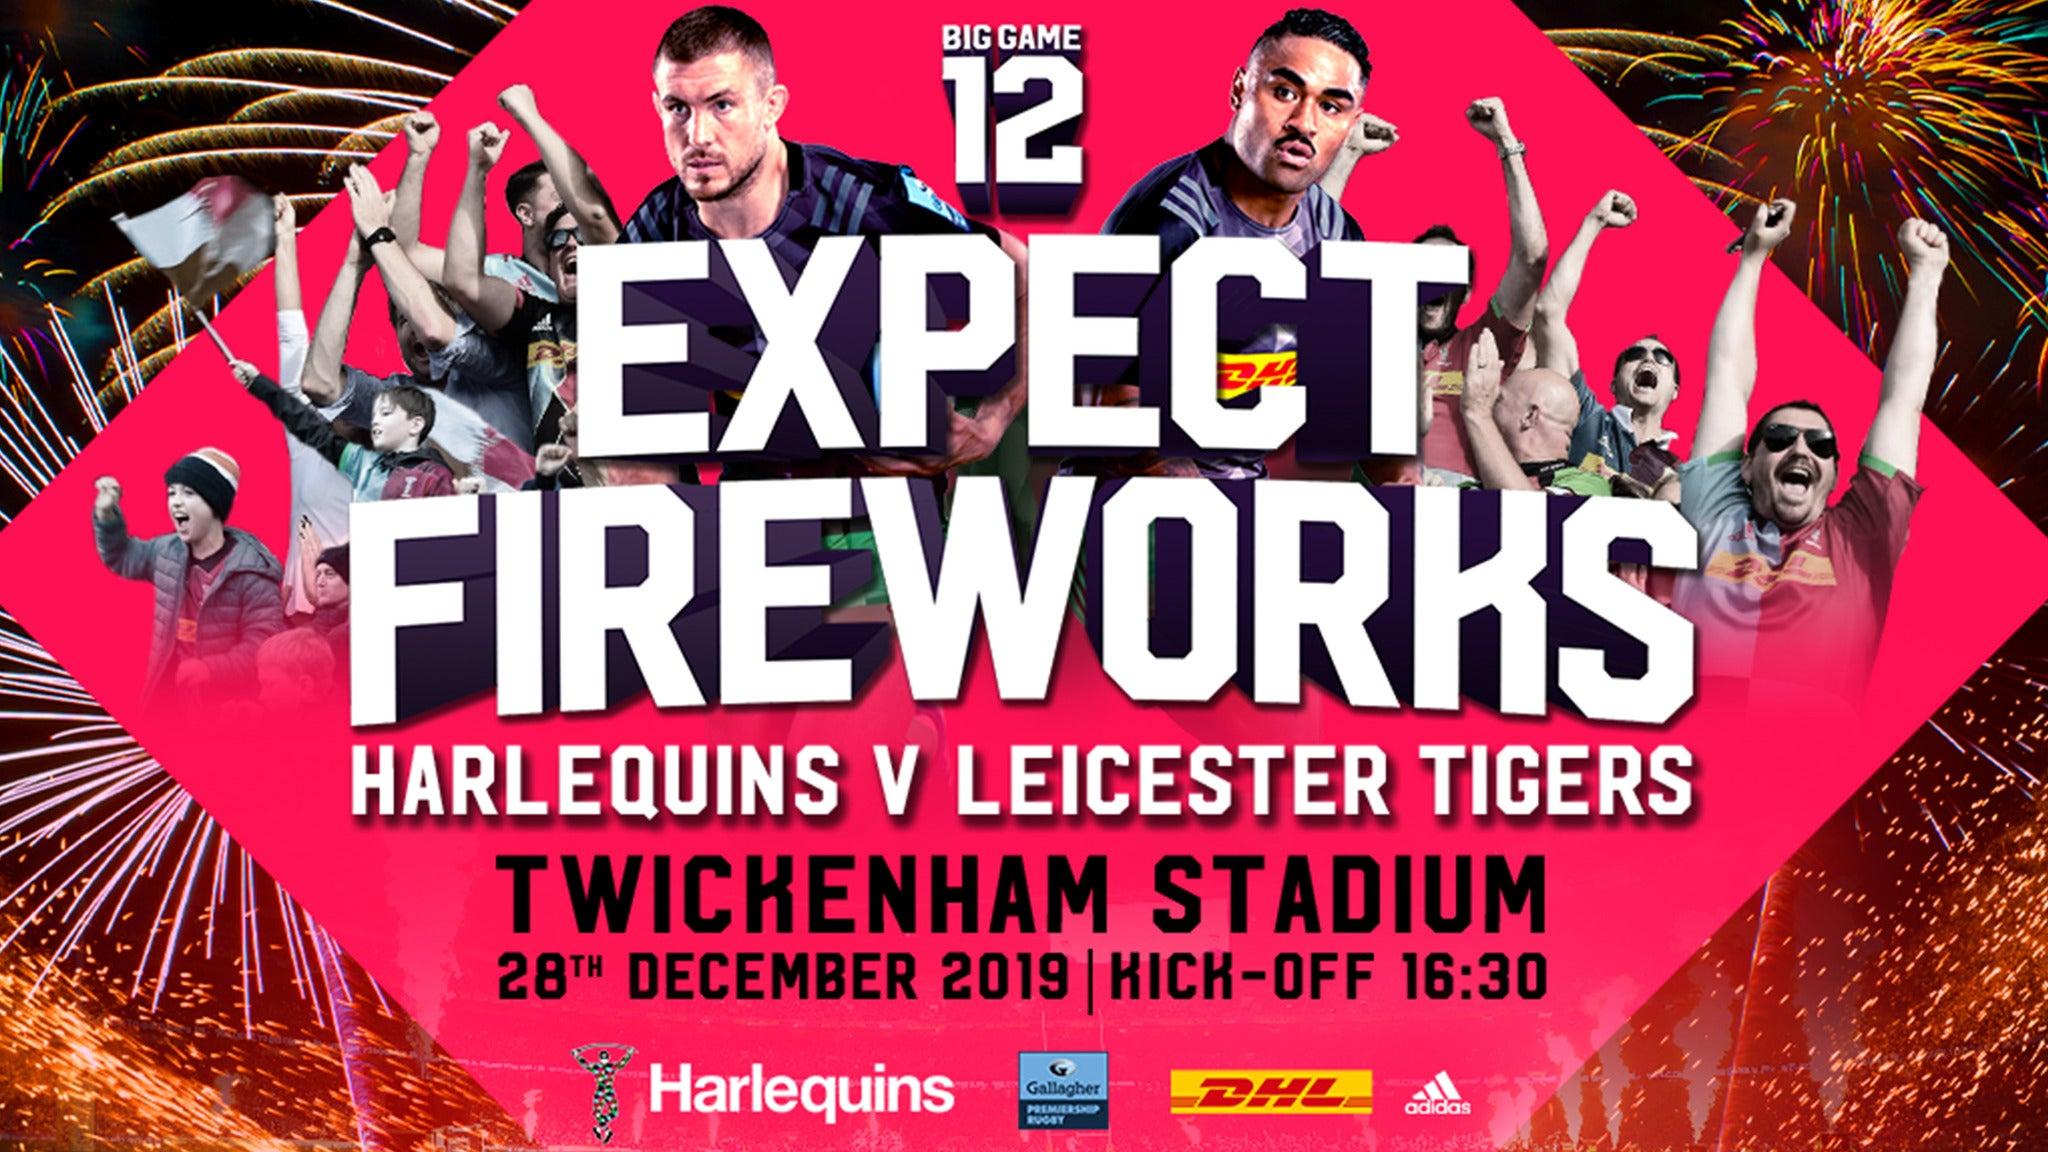 Big Game 12: Harlequins V Leicester Tigers Twickenham Stadium Seating Plan